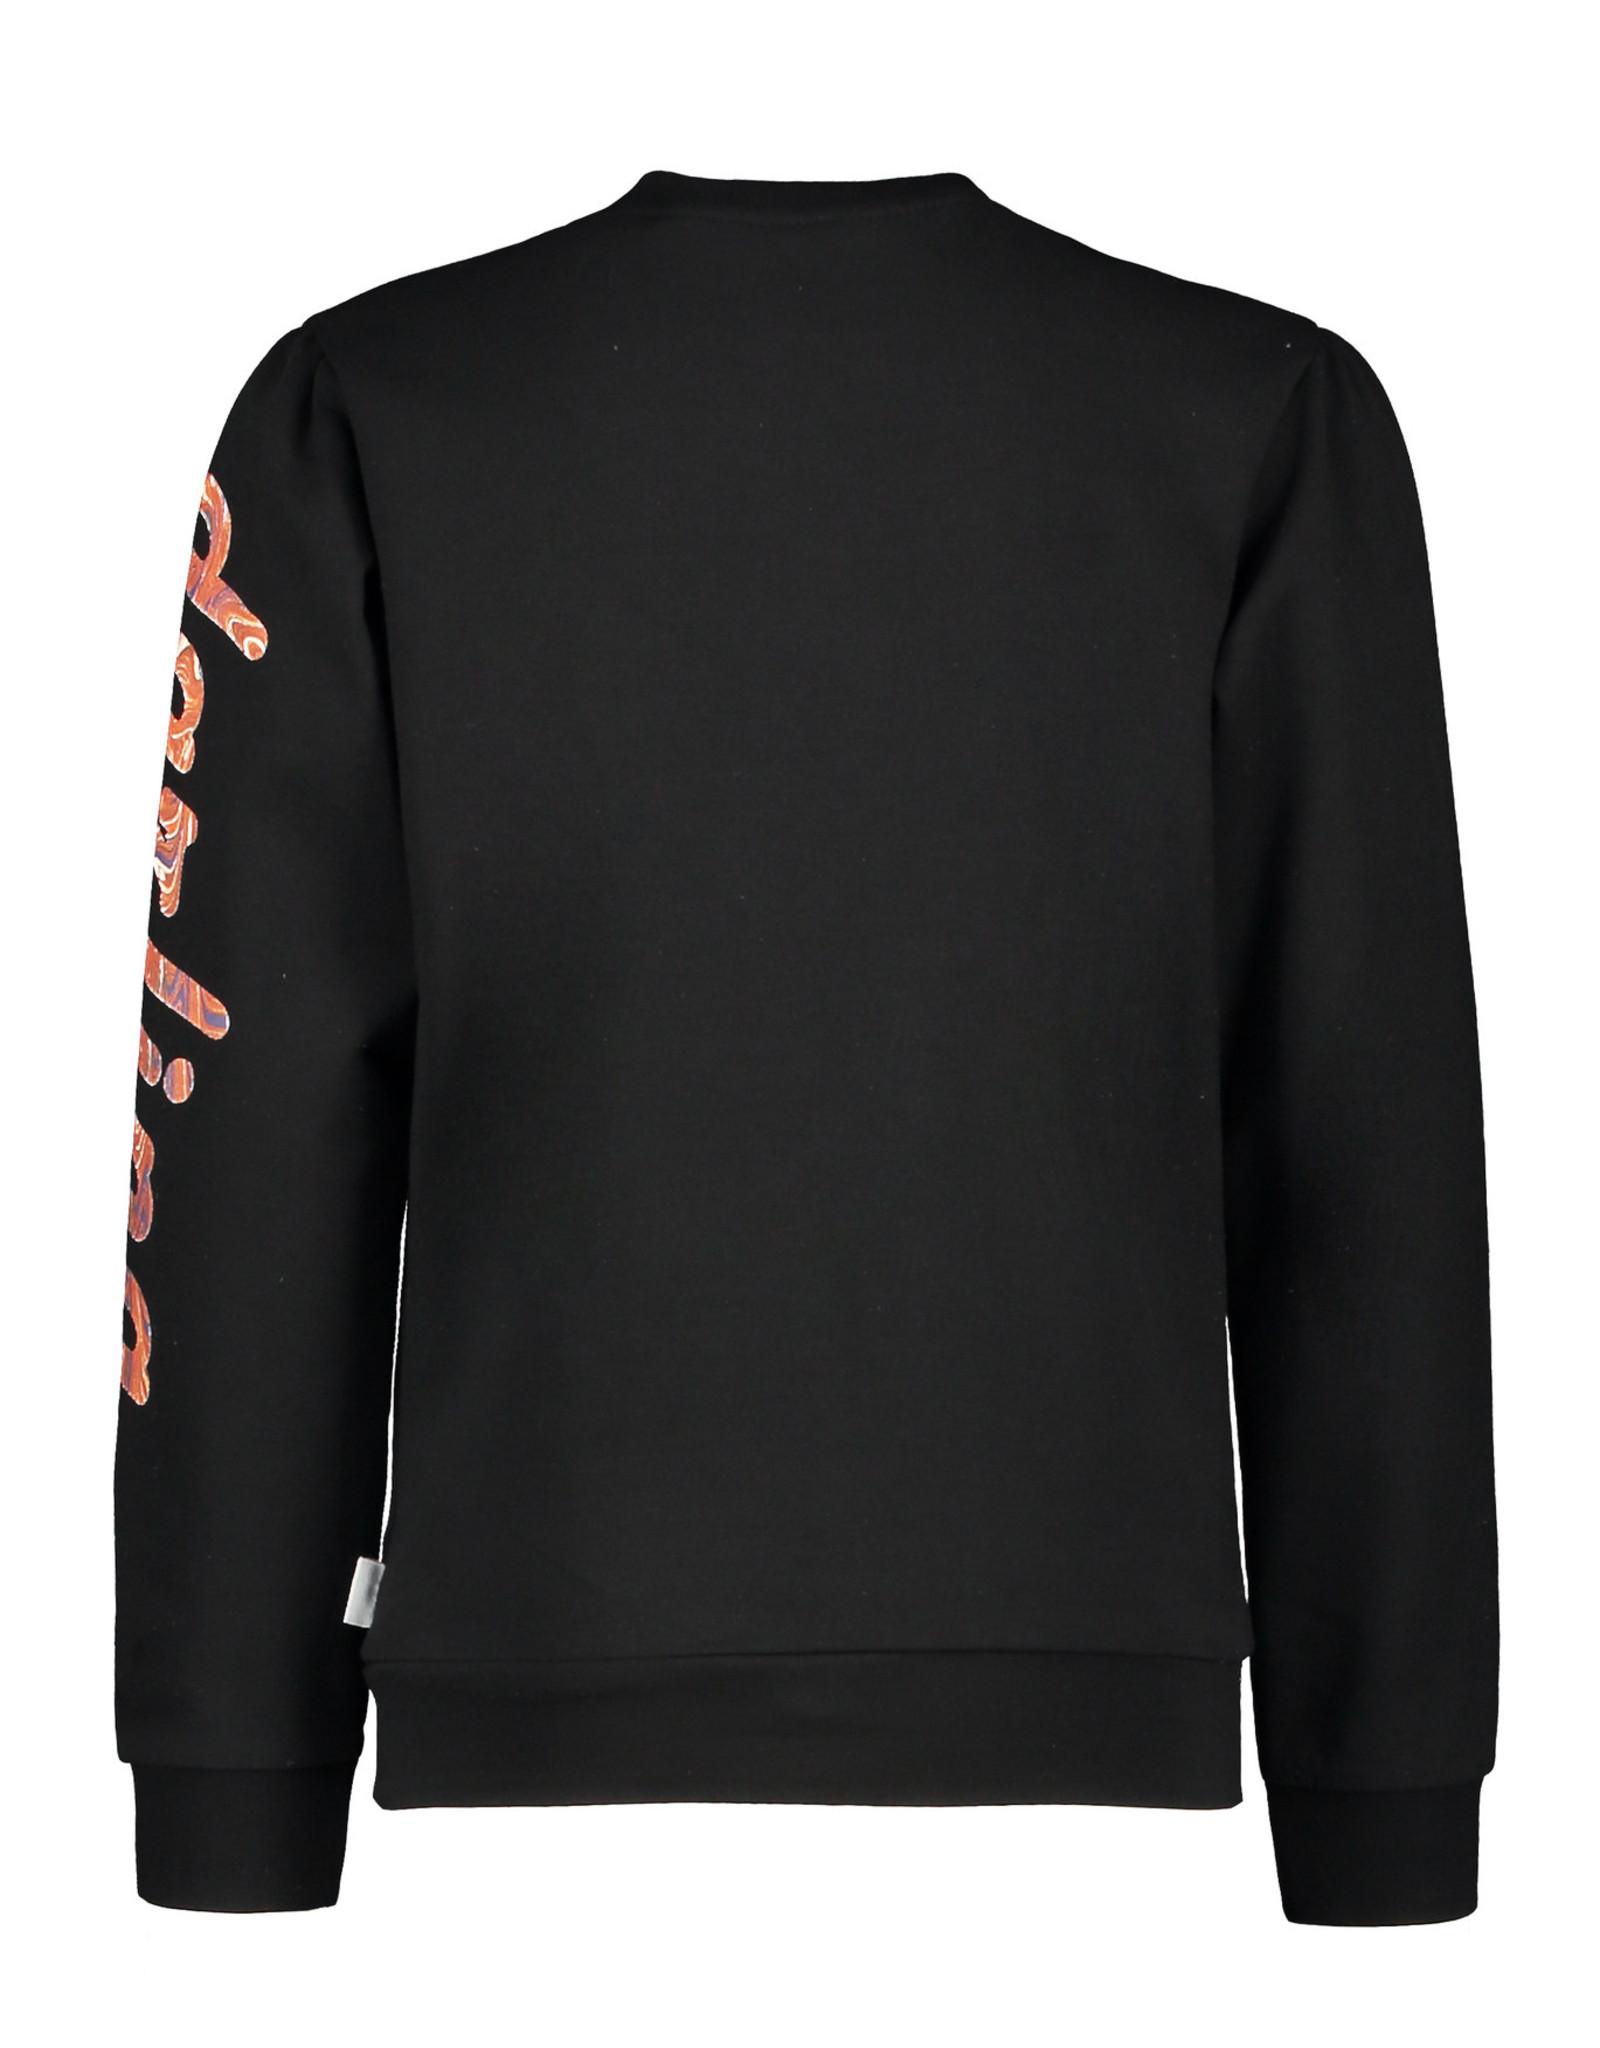 Moodstreet Moodstreet sweater 5331 black